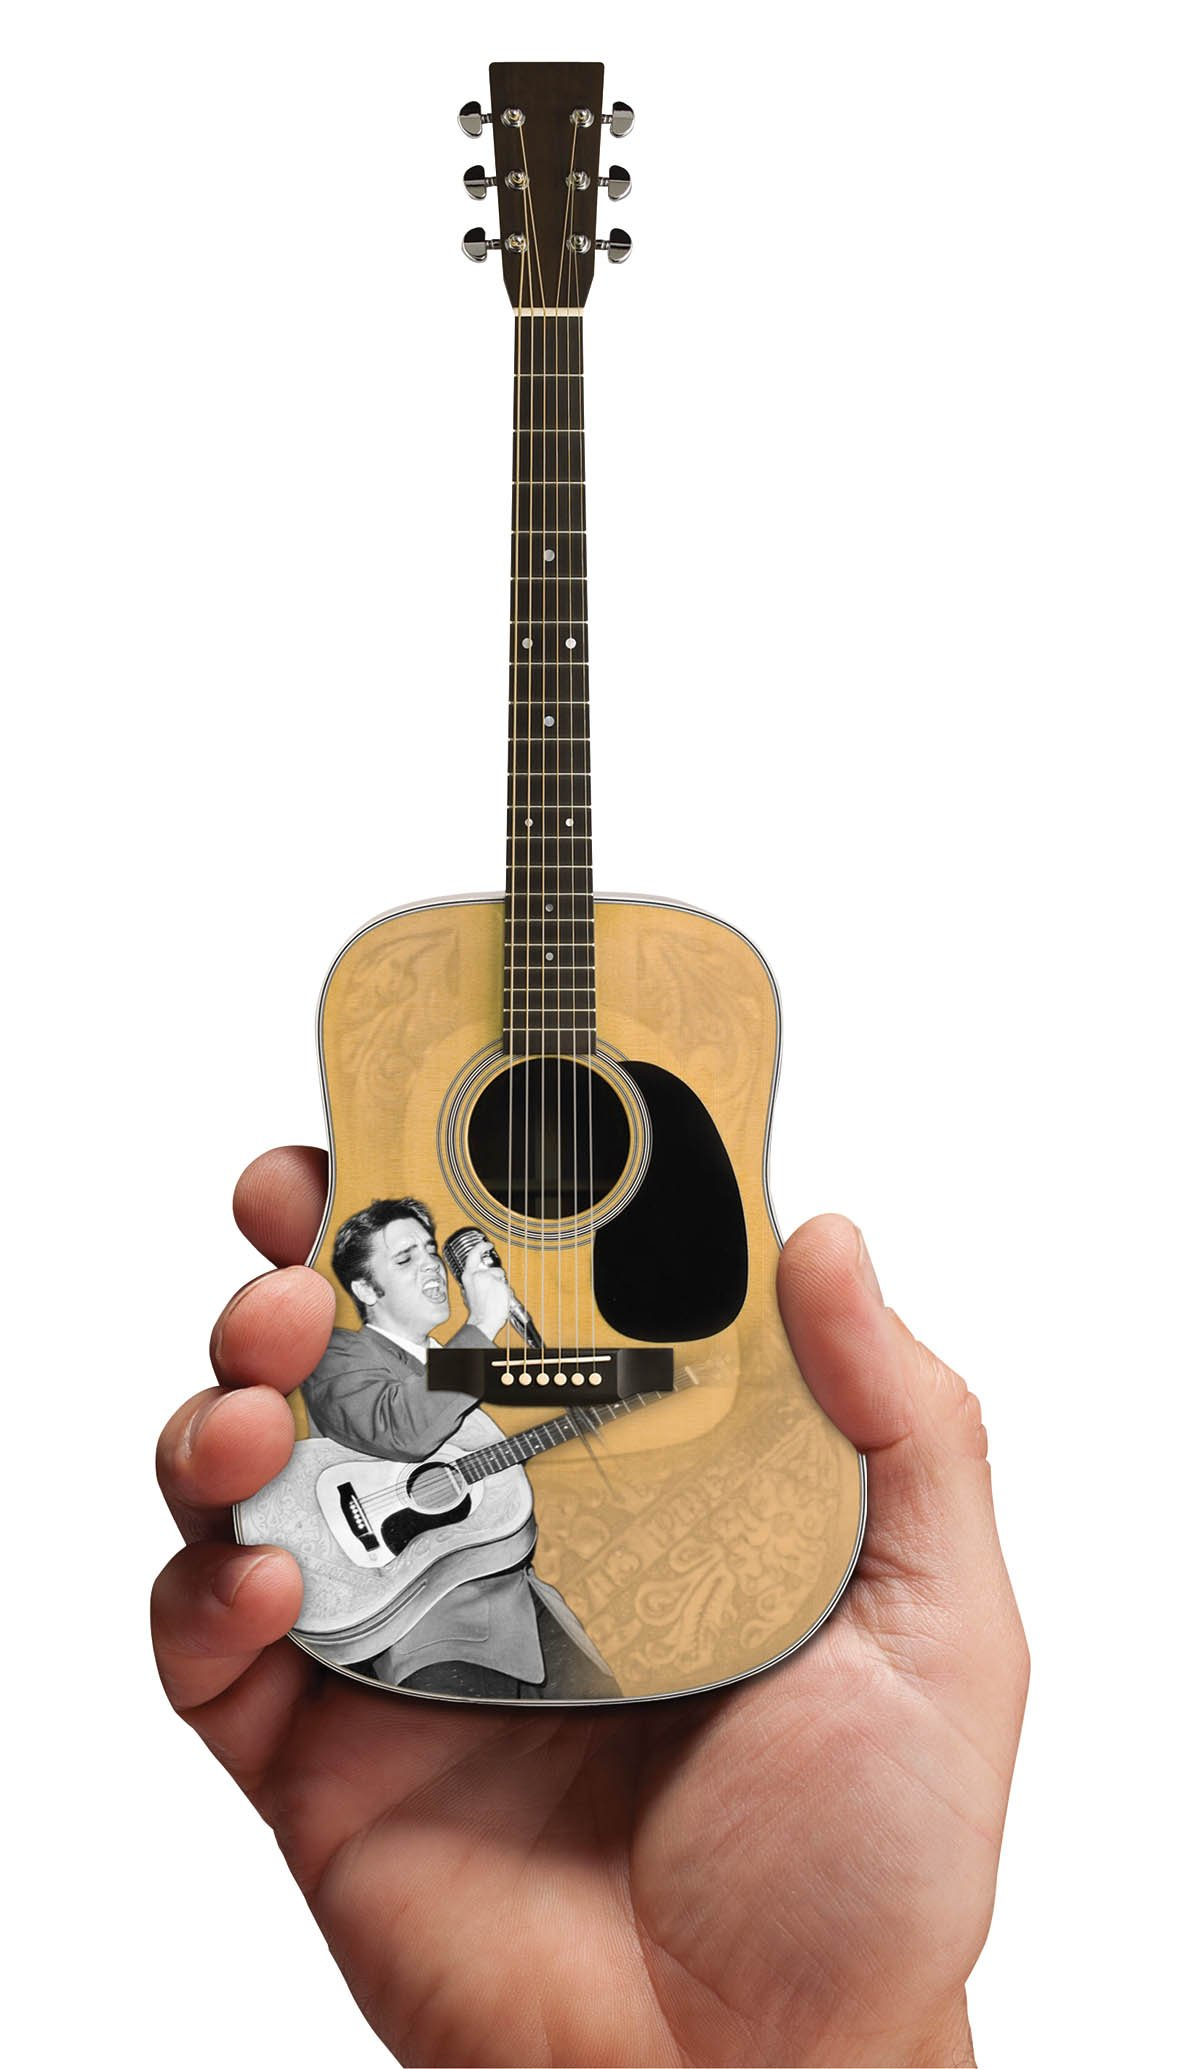 Axe Heaven EP-360 Licensed Elvis Presley '55 Tribute Acoustic Mini Guitar Replication